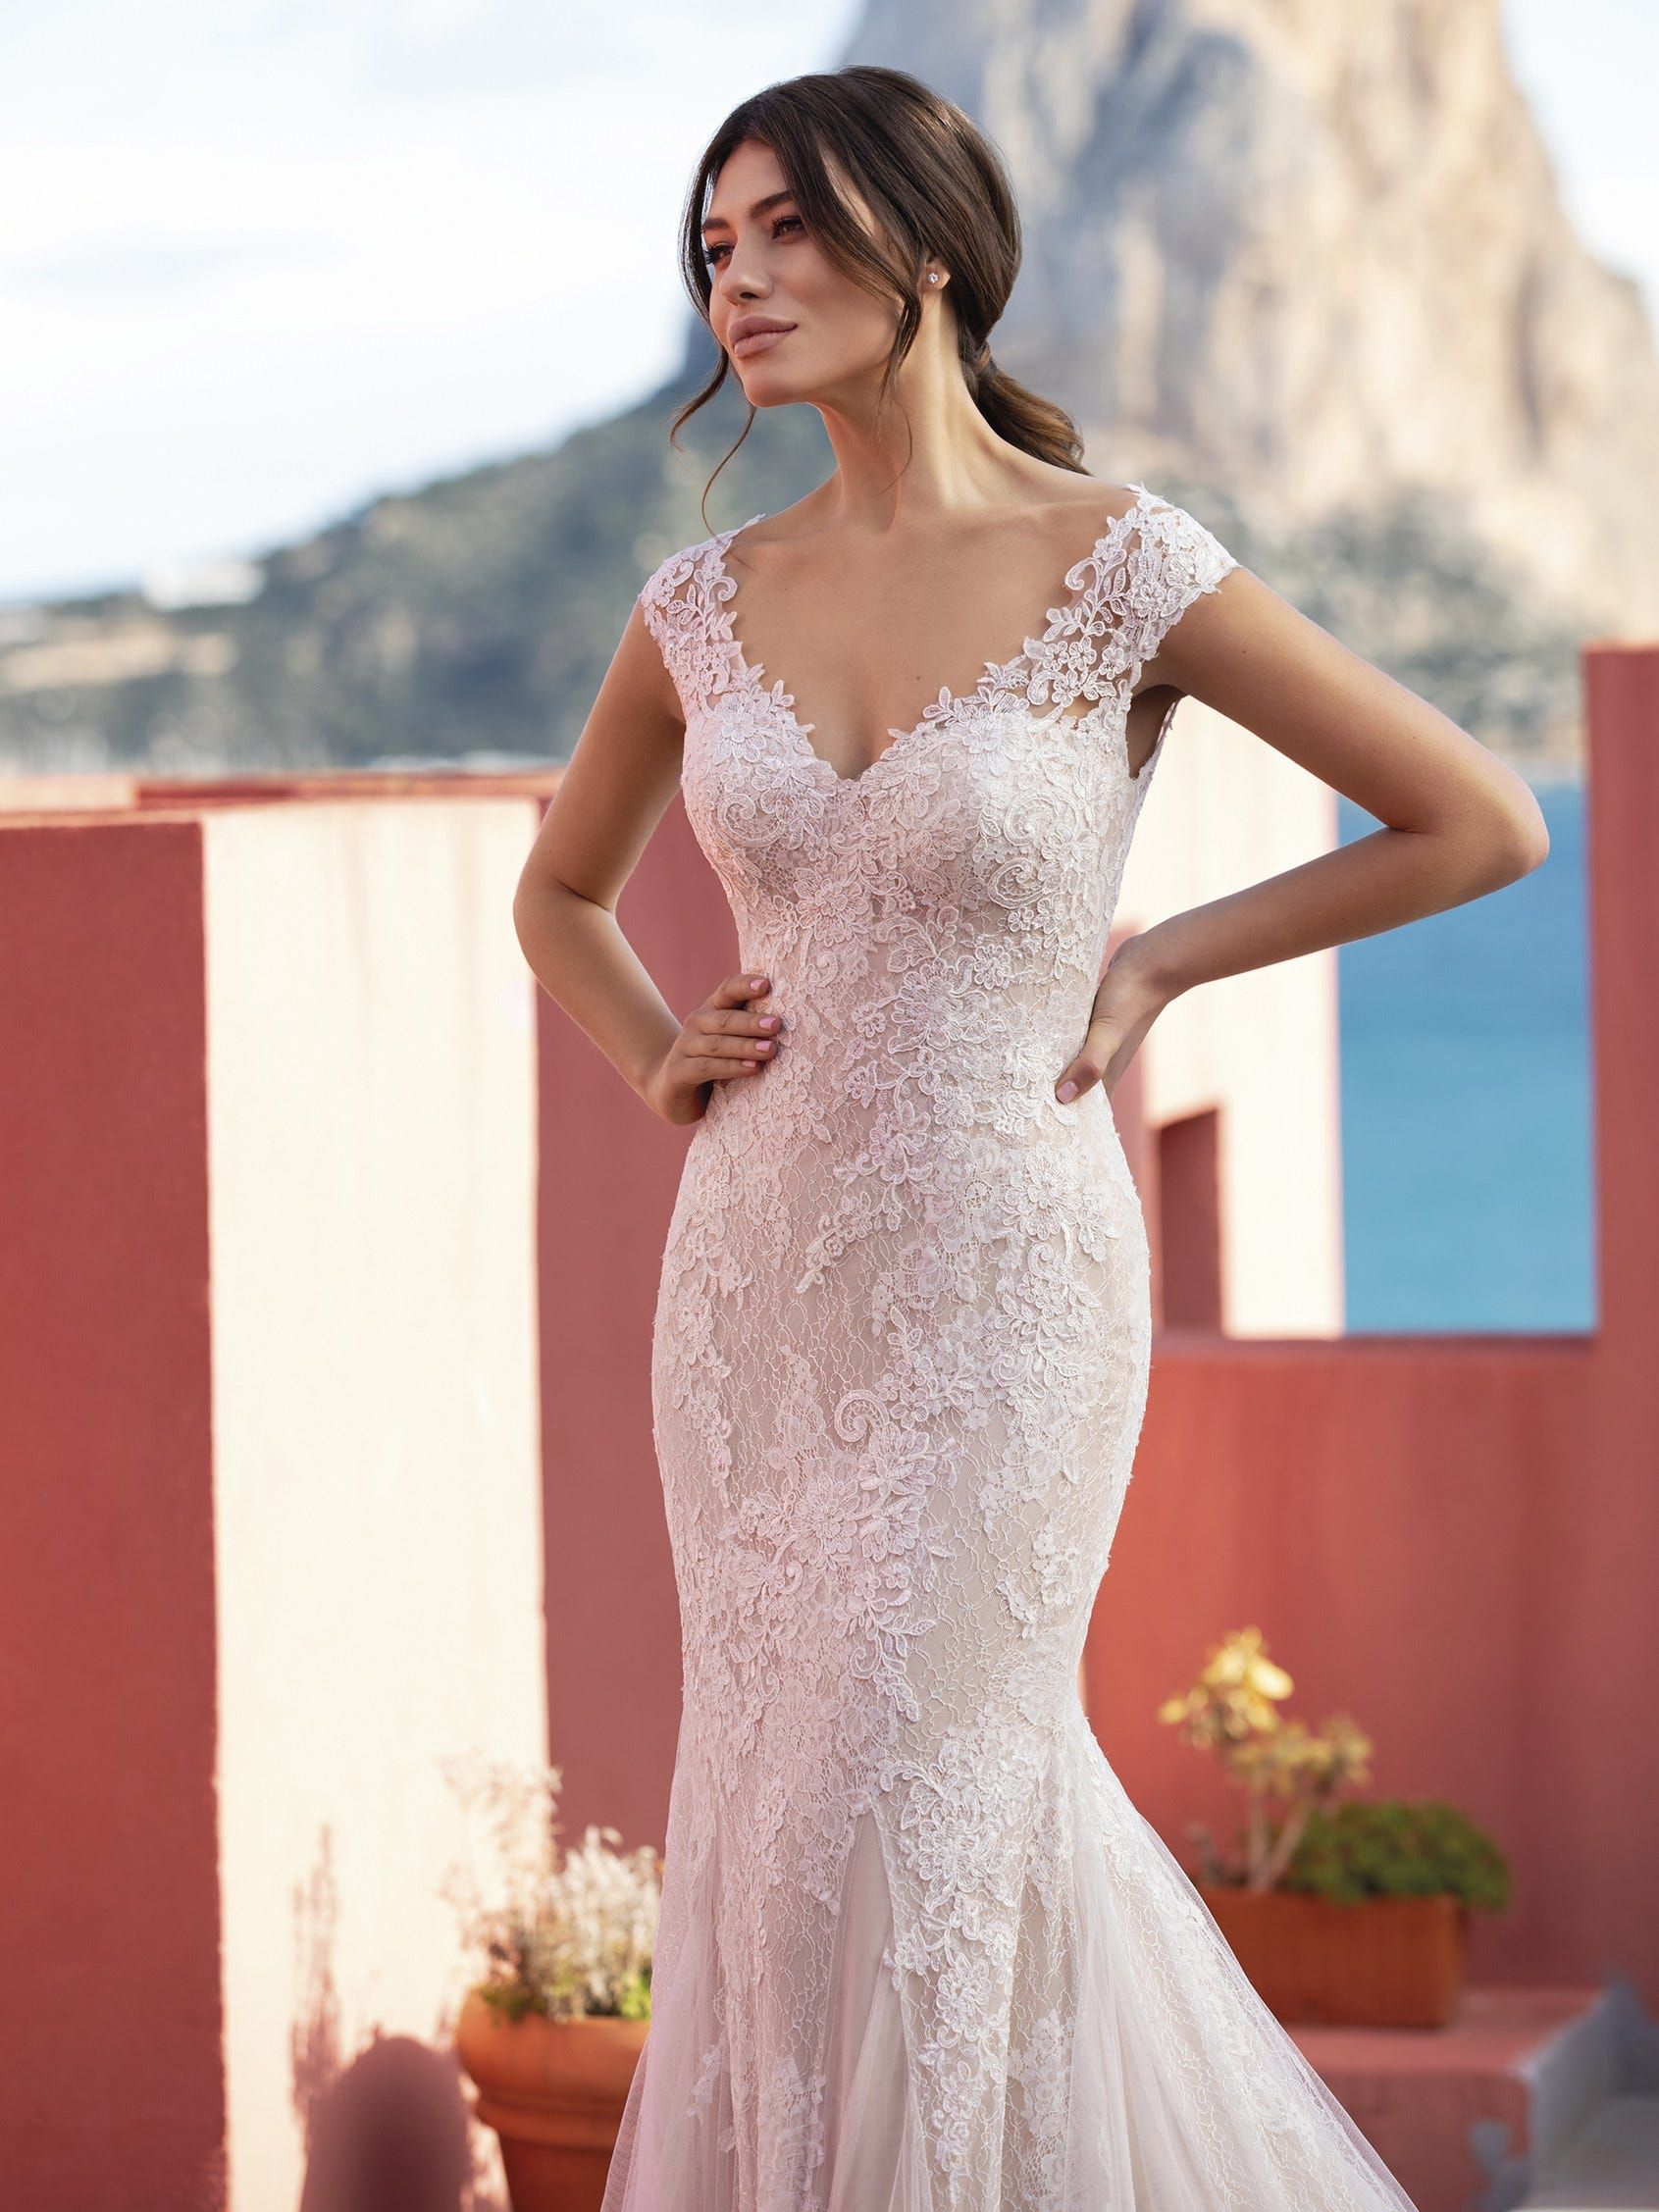 G 206 Collection No Vii Bridal Dresses Galia Lahav Wedding Dresses Galia Lahav Wedding Dress Bridal Dresses [ 1102 x 736 Pixel ]